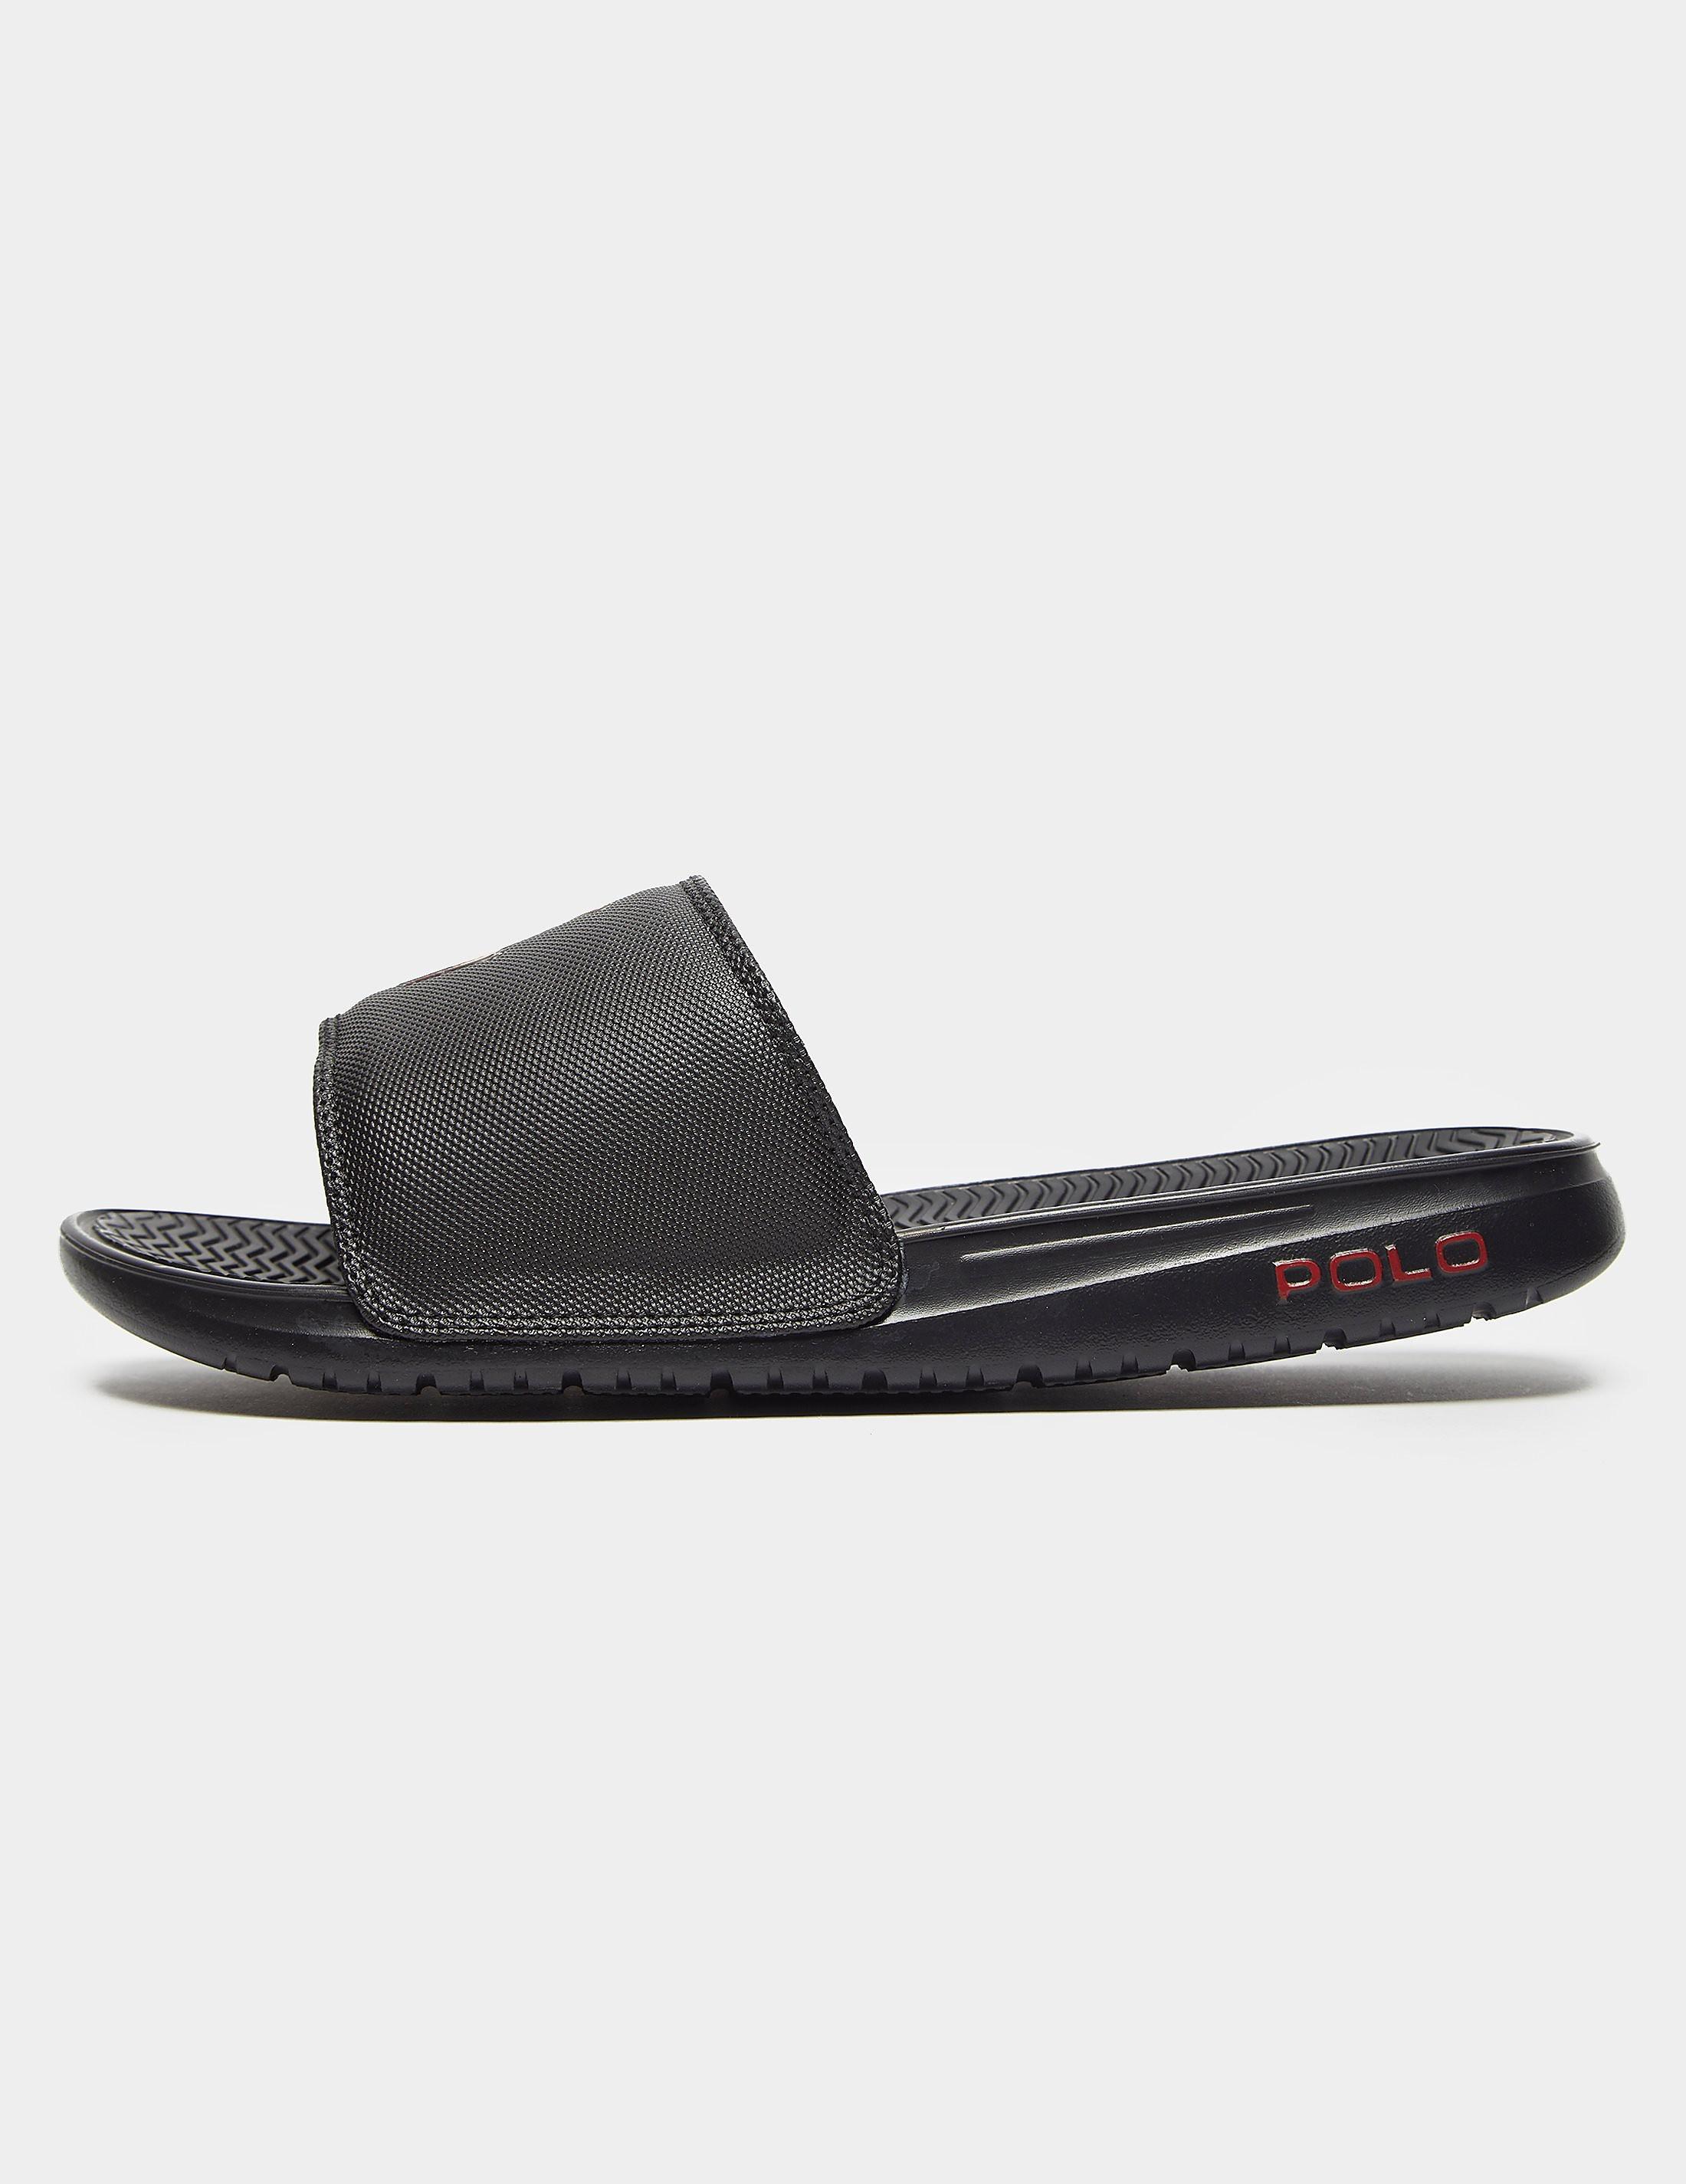 c29a29687 Mens Polo Ralph Lauren Rodwell Slides Black